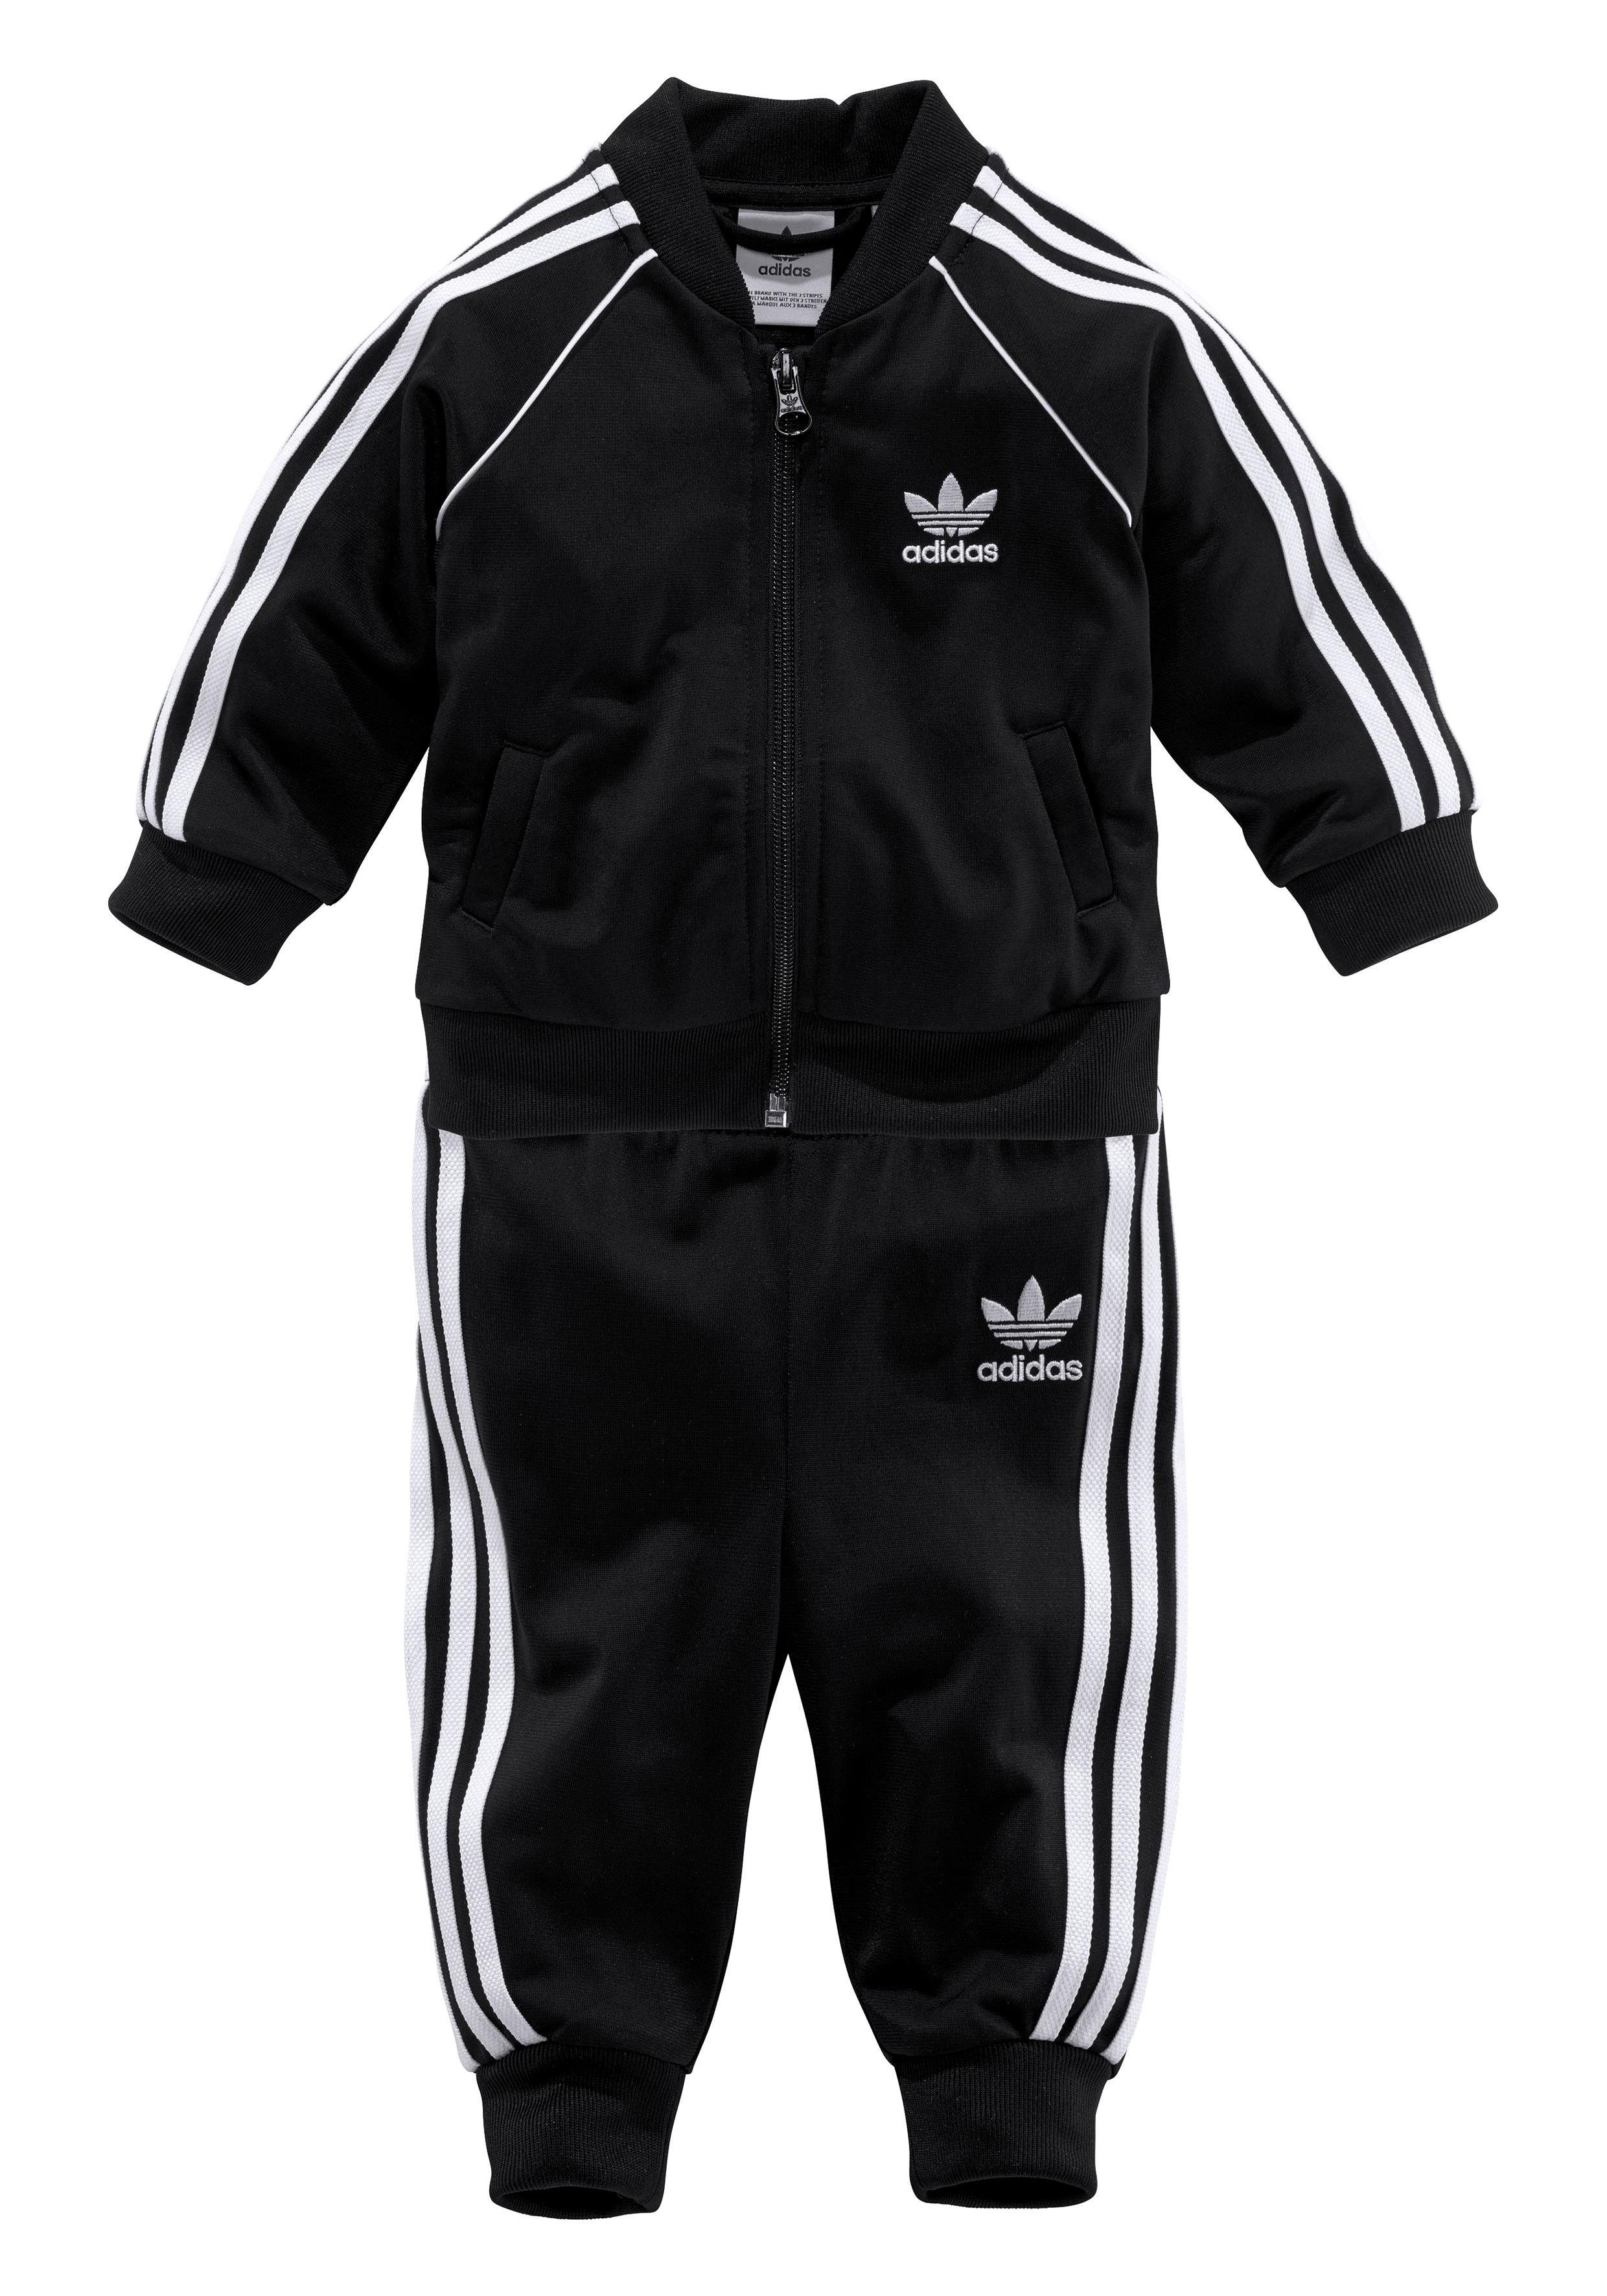 Unisex adidas Originals Trainingsanzug »SUPERSTAR SUIT« (Set, 2-tlg) rot, schwarz   04060515223871